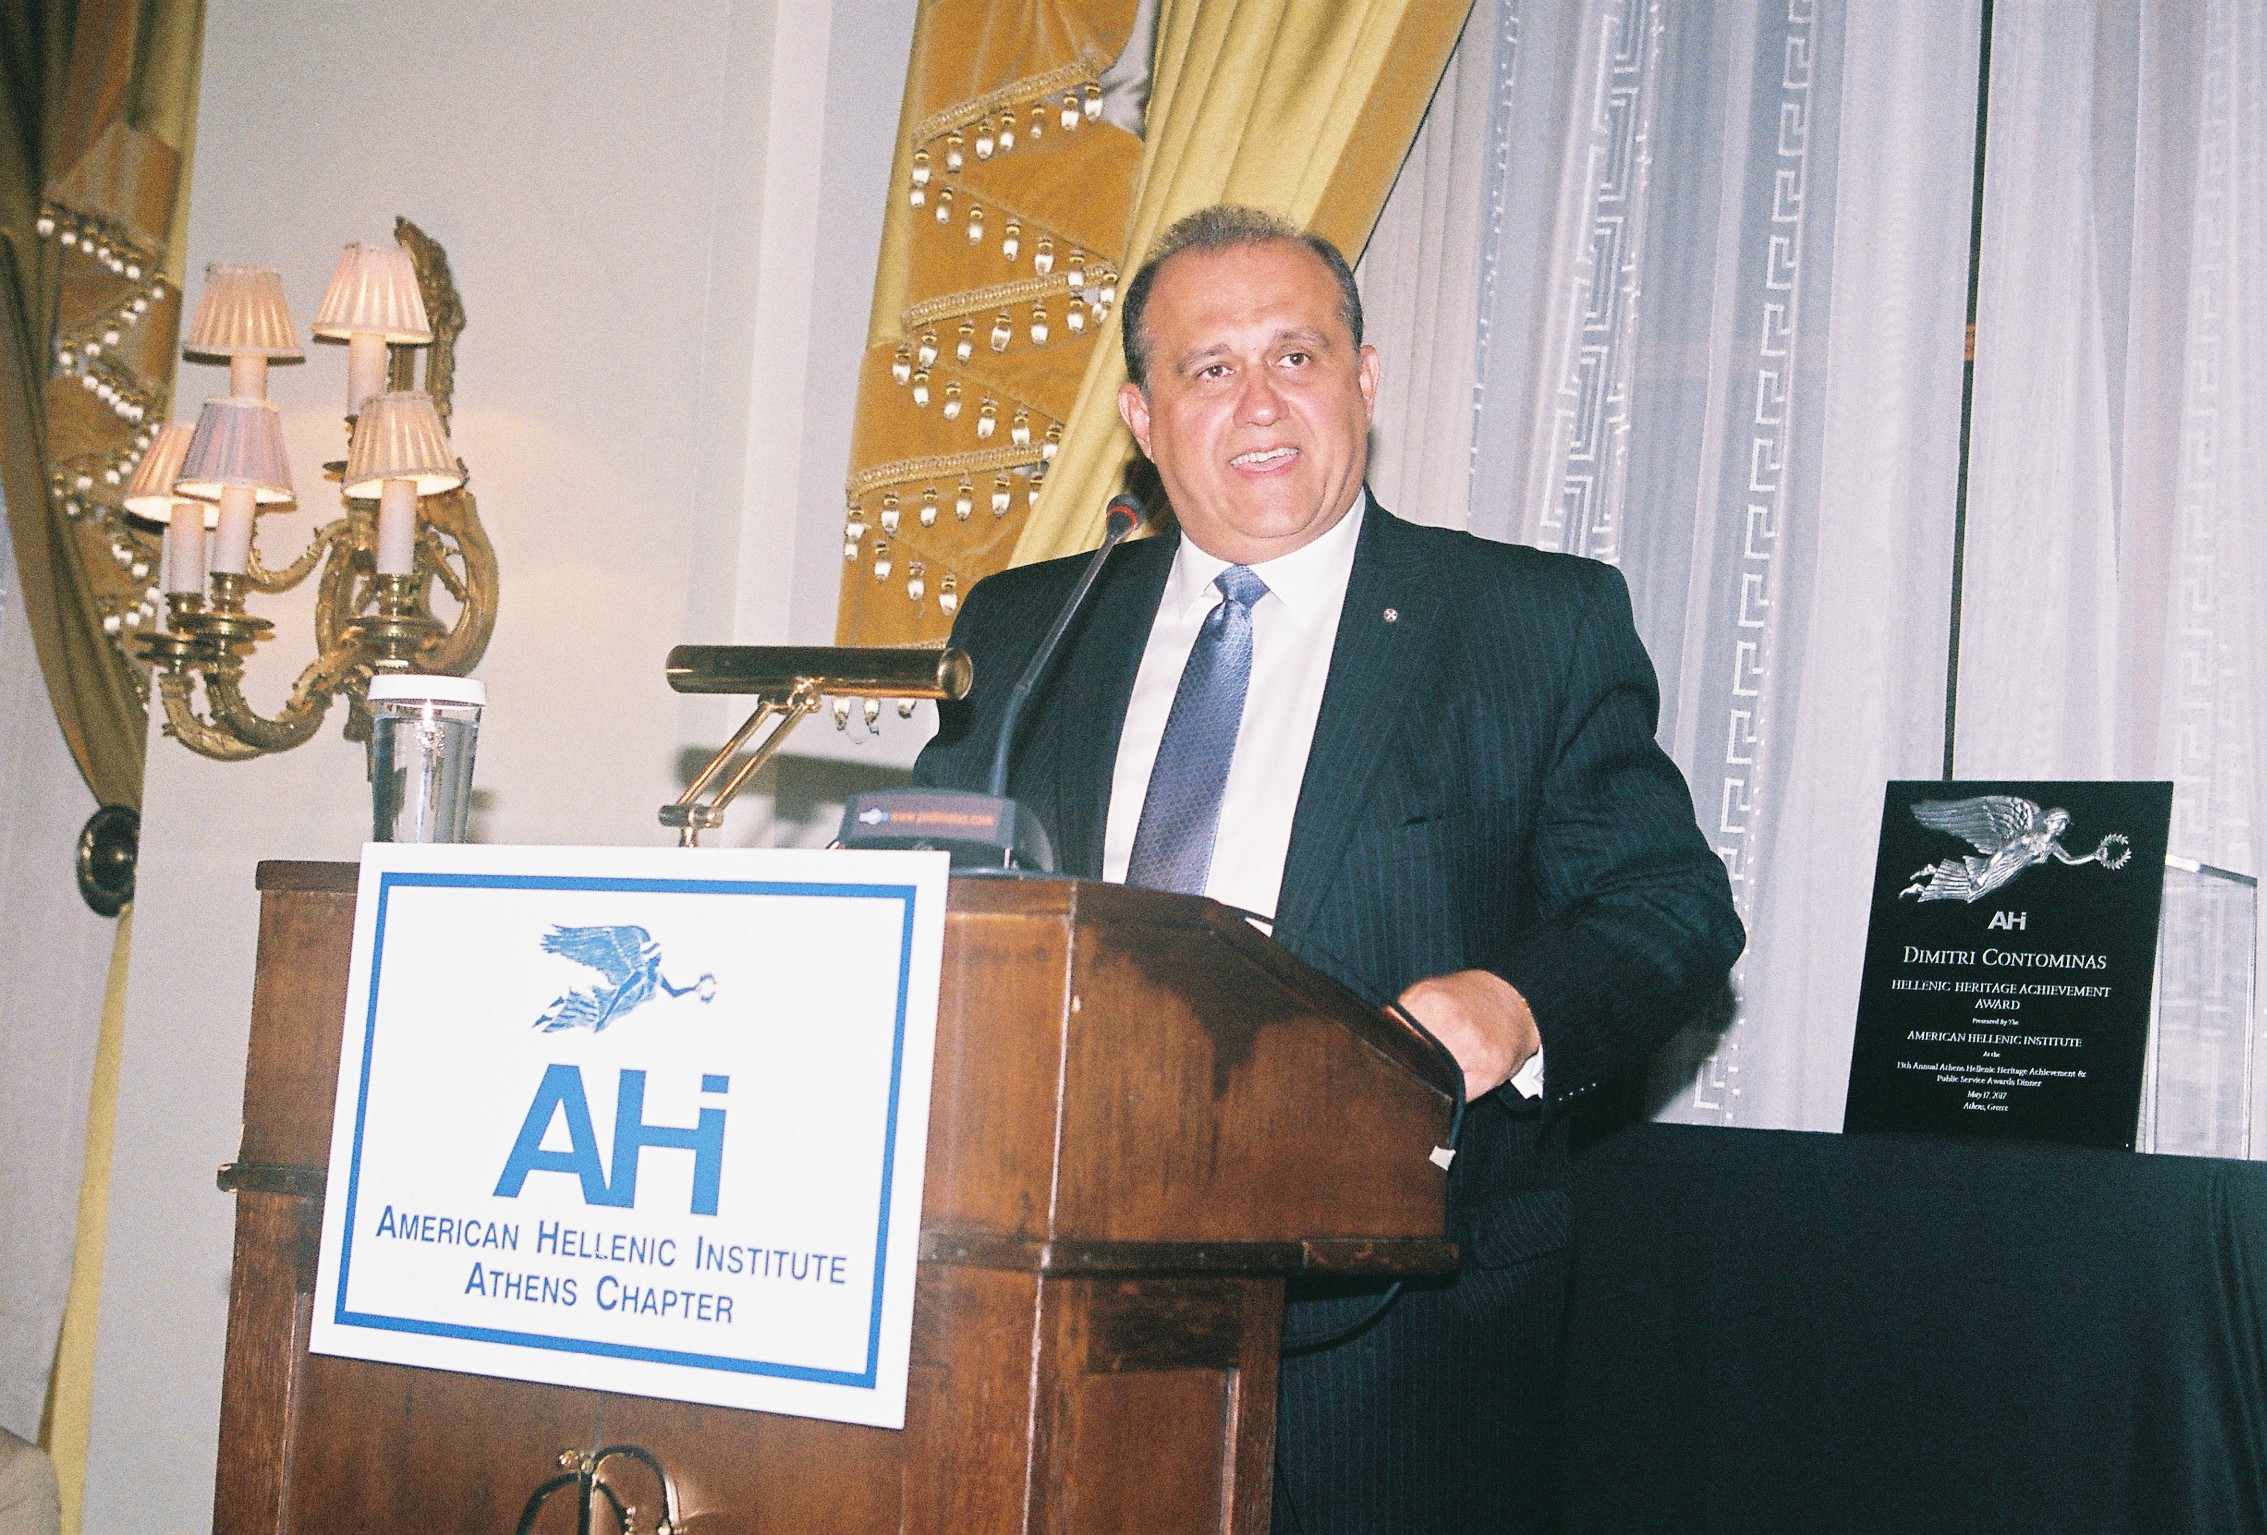 Nick Larigakis, President of the American Hellenic Institute